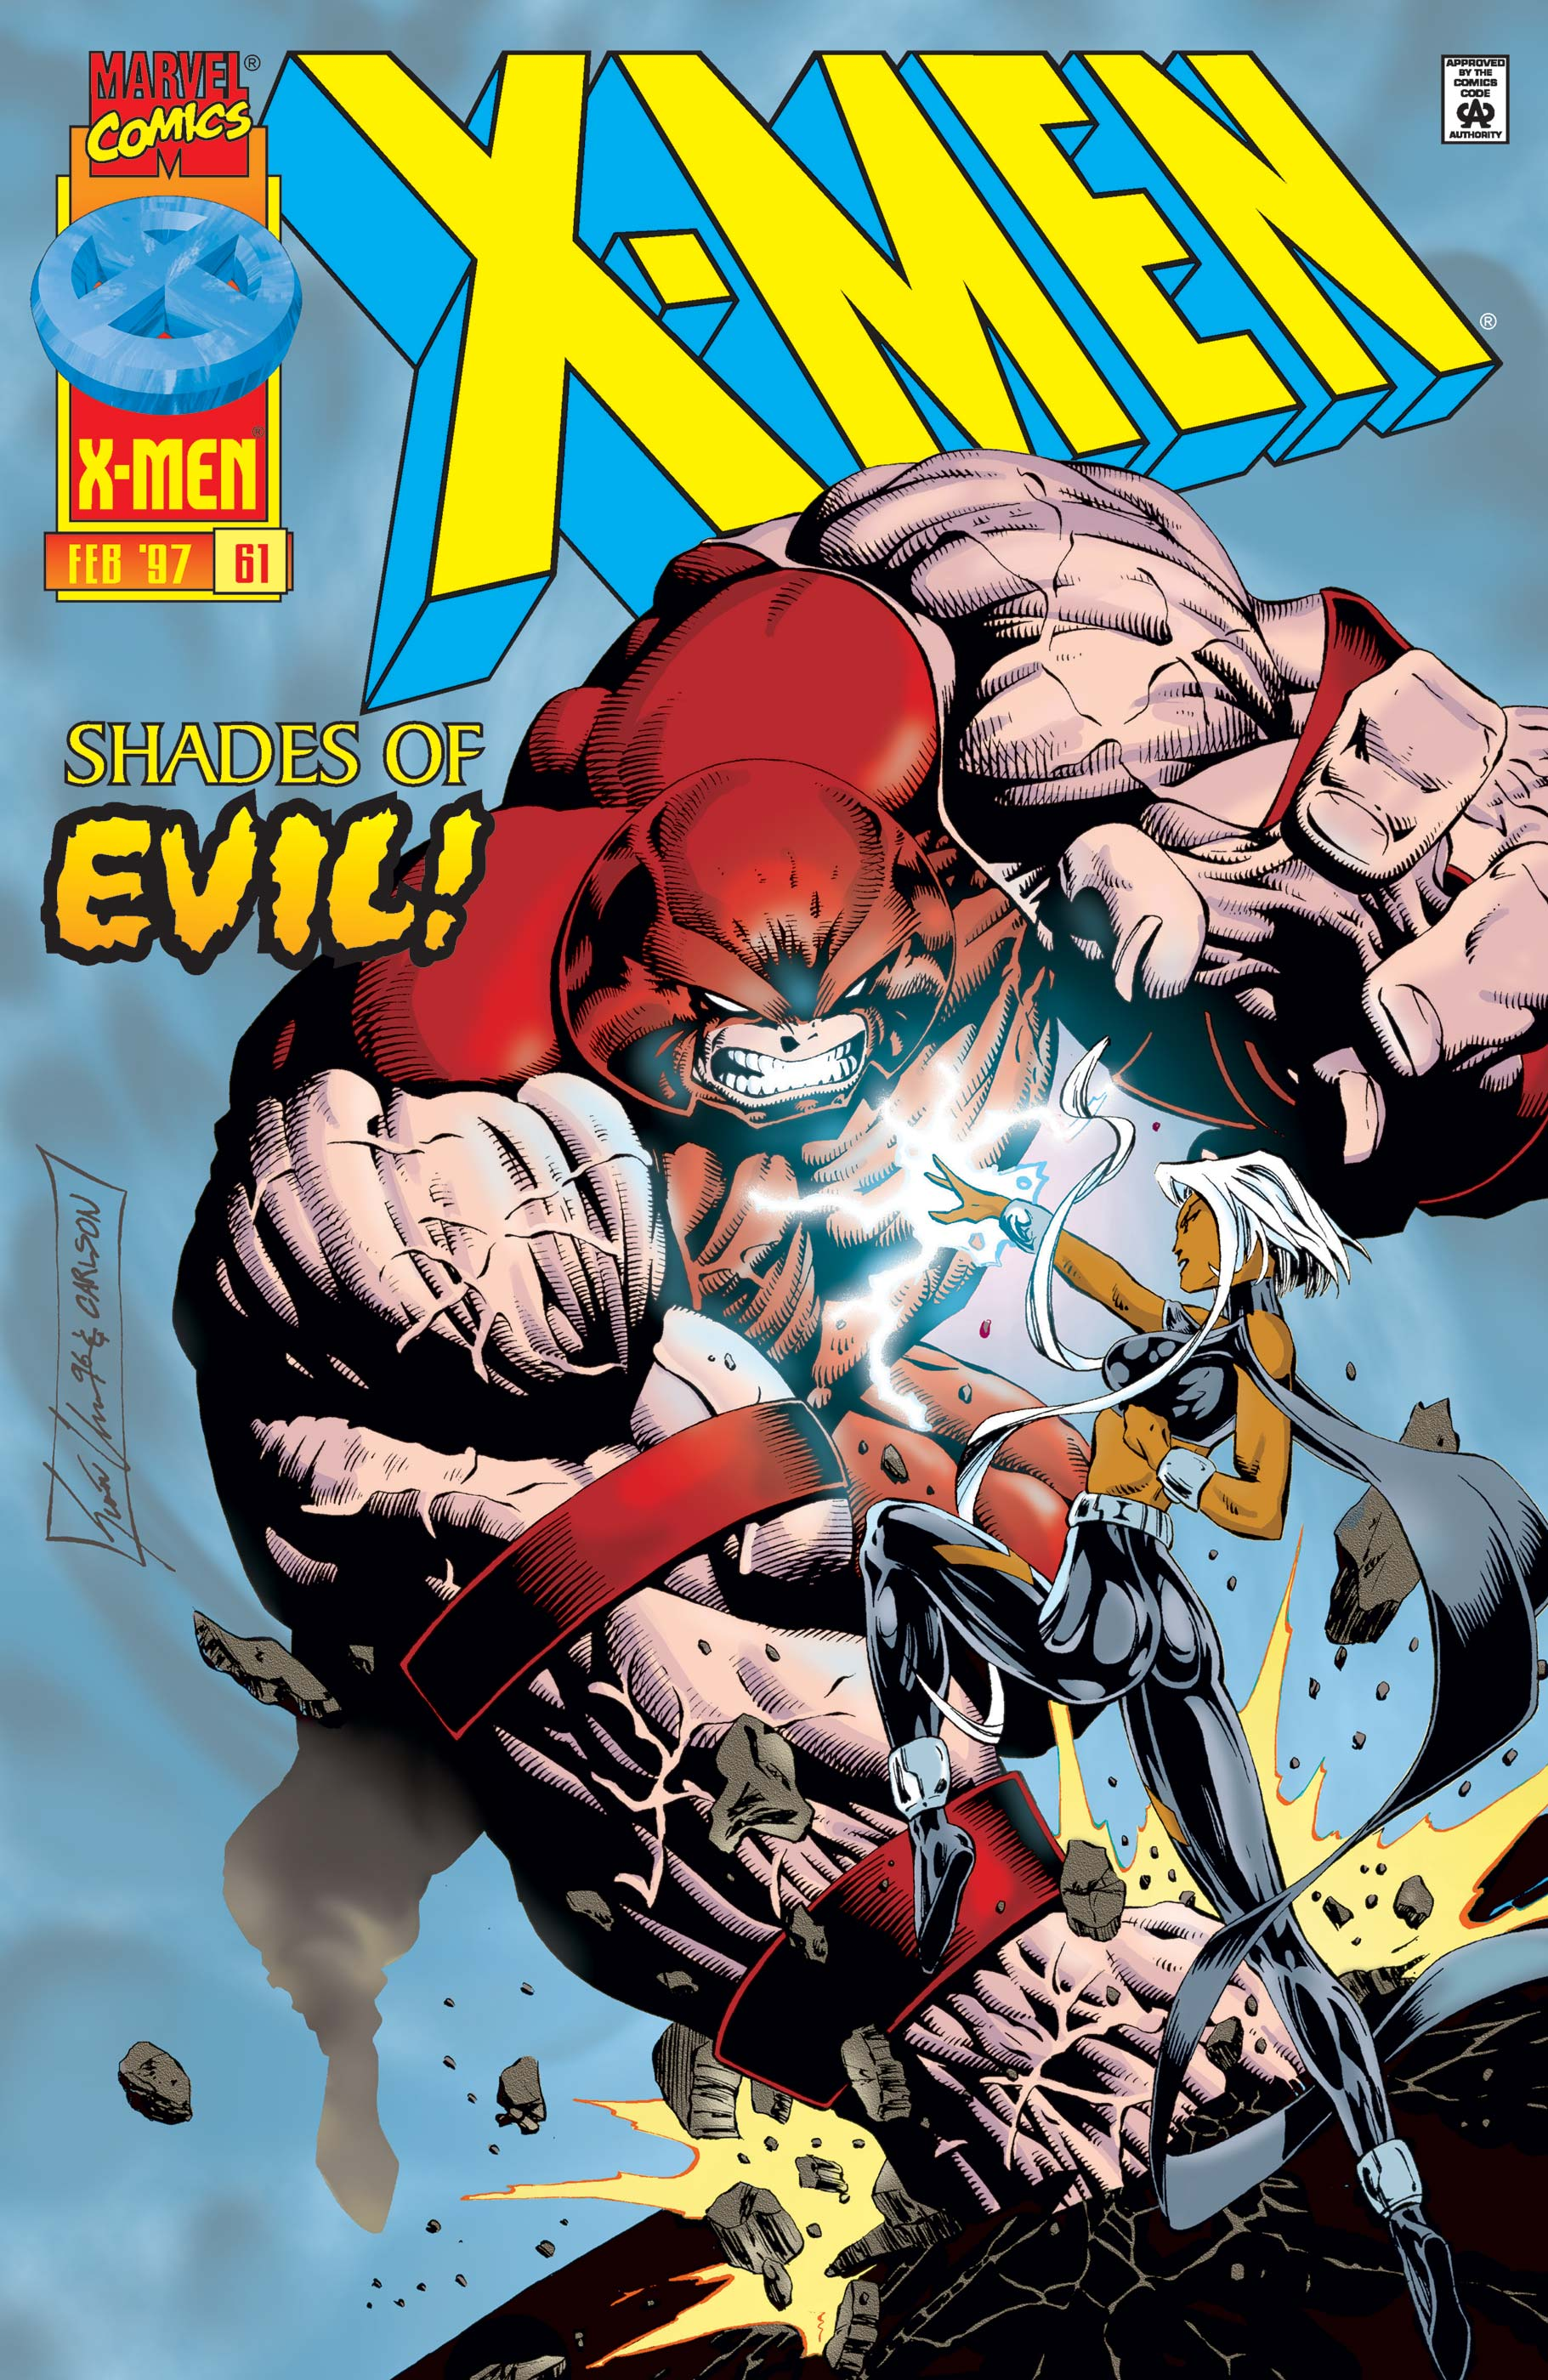 X-Men (1991) #61